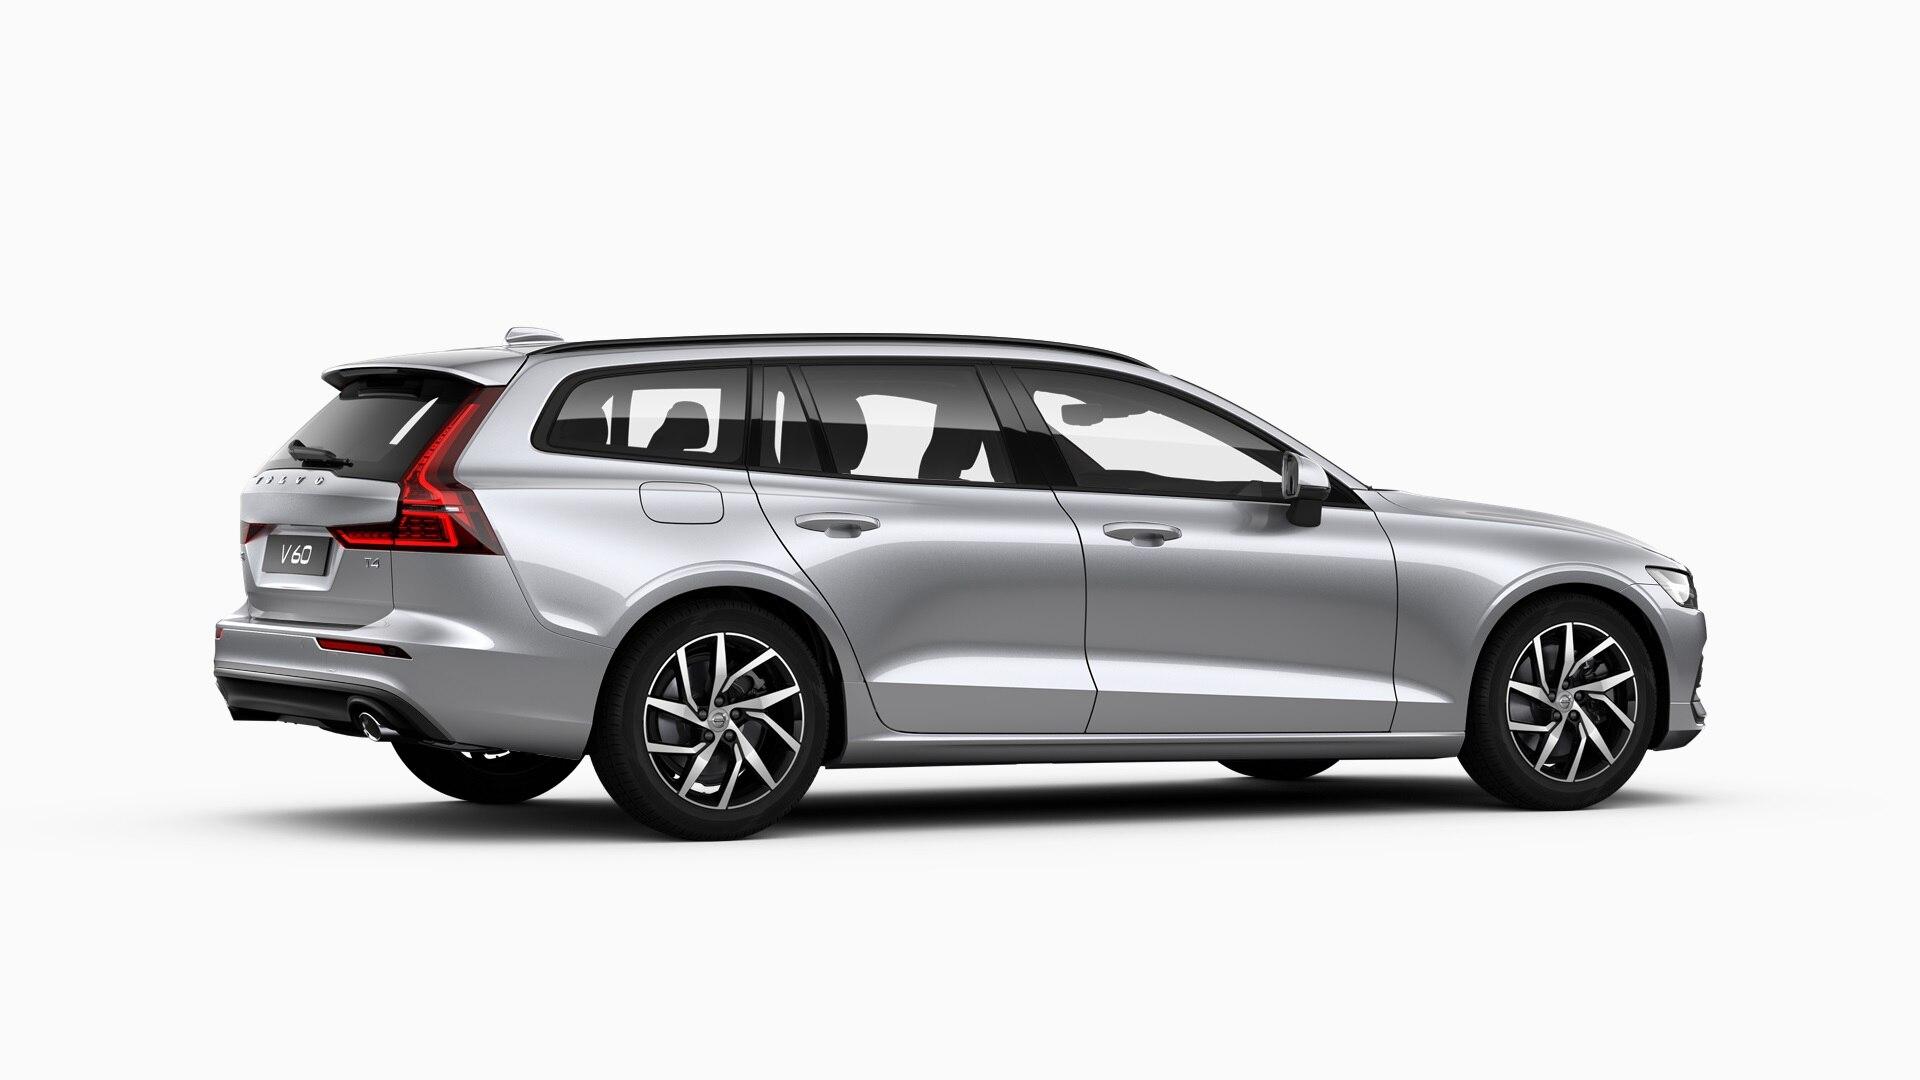 Volvo V60 autoliising | Sixt Leasing